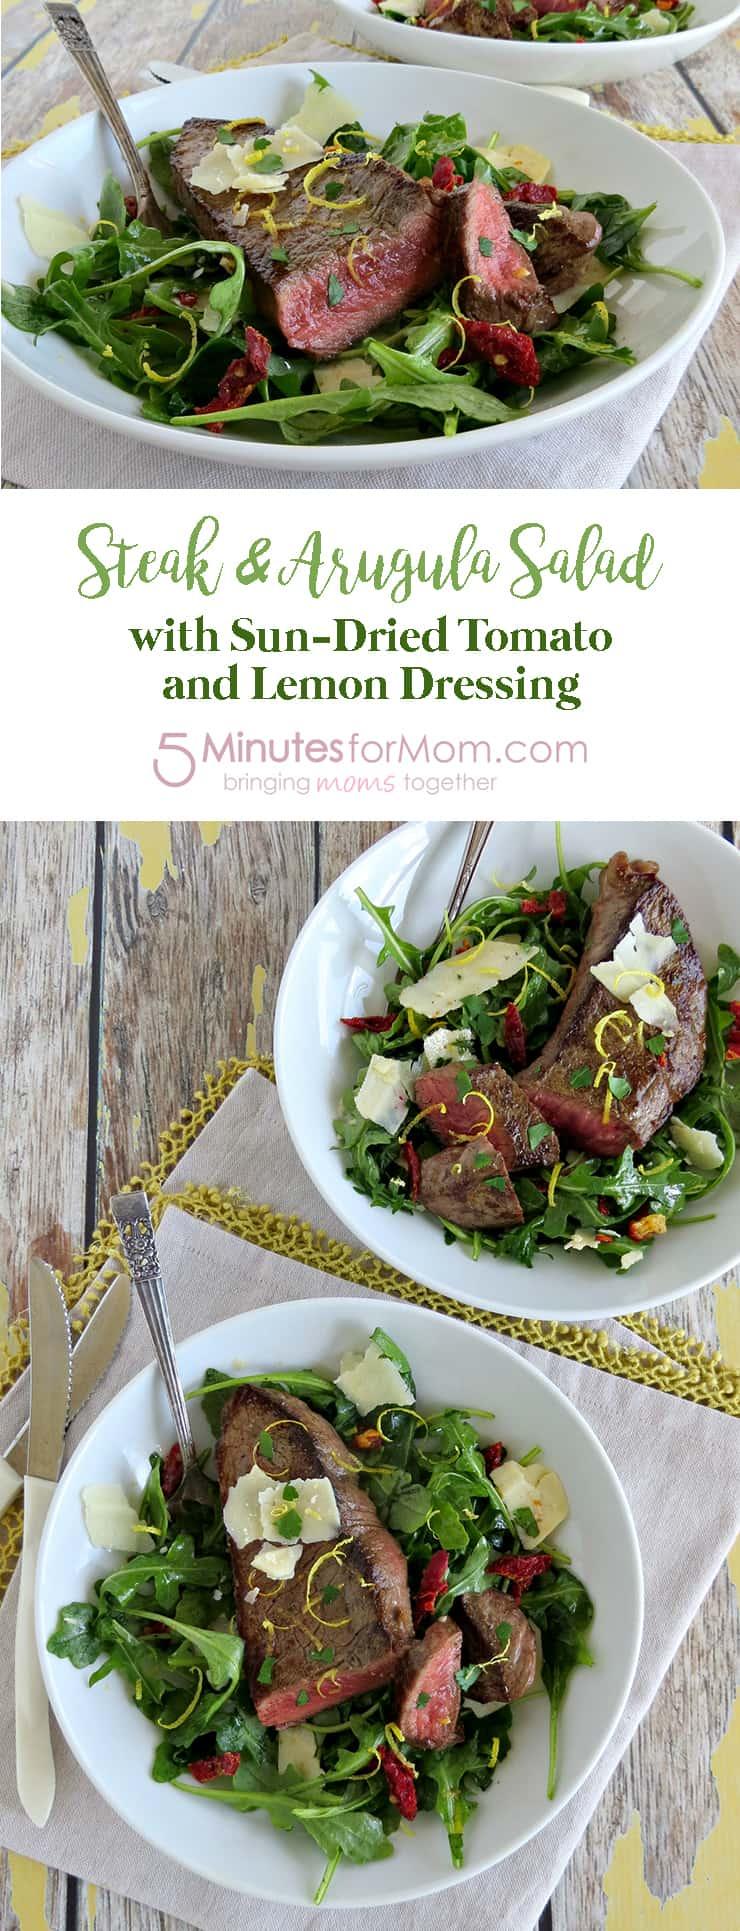 Steak & Arugula Salad with Sun-Dried Tomato & Lemon Dressing